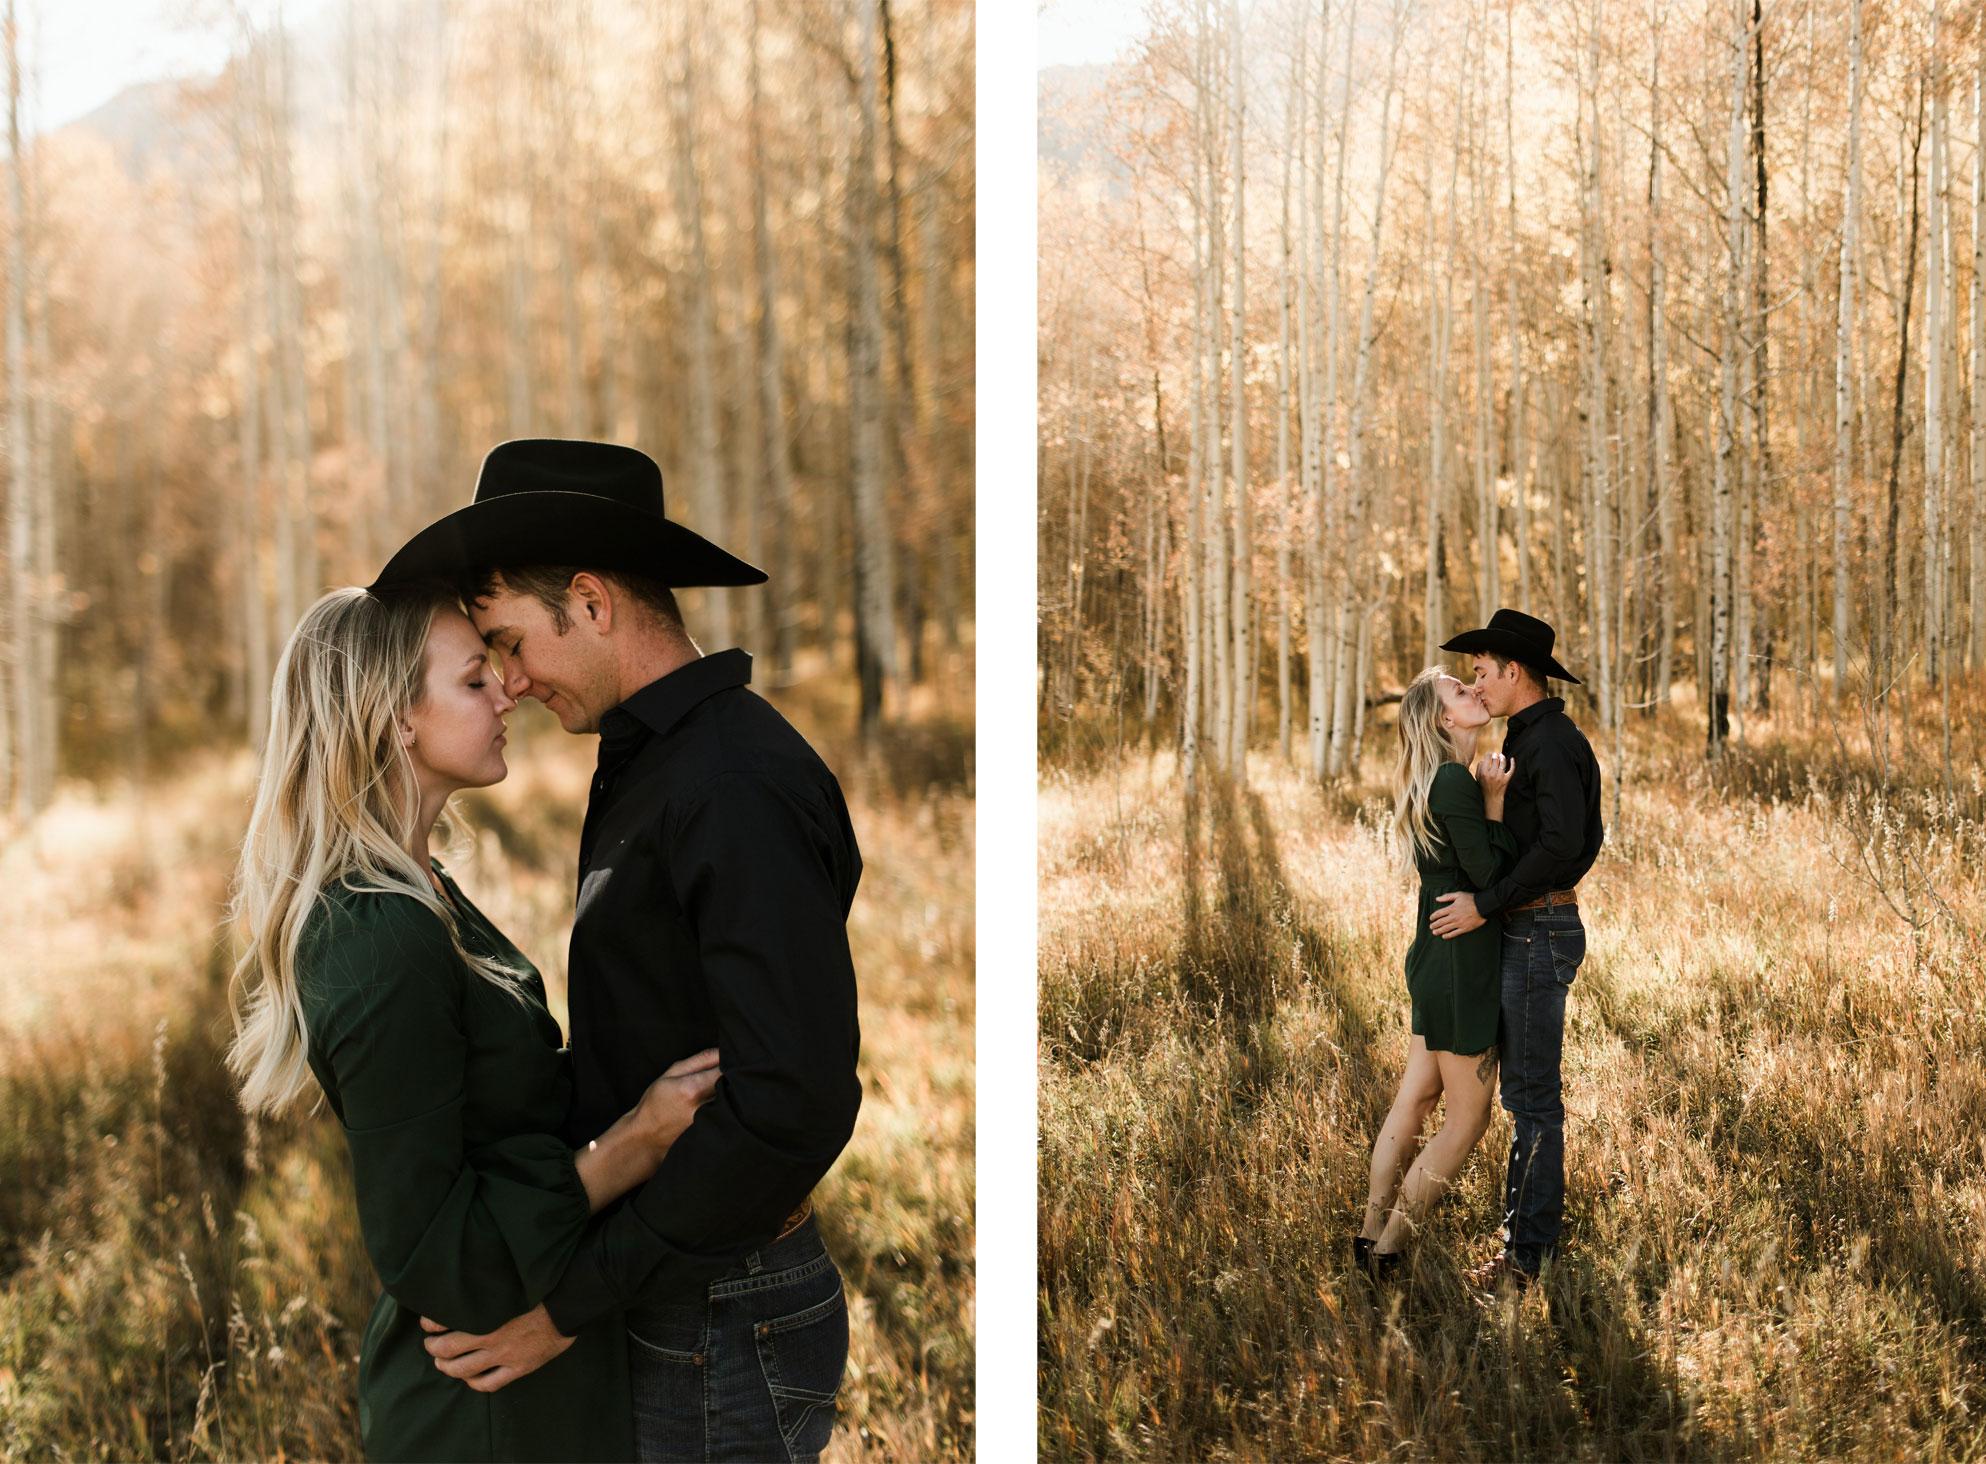 An Autumn Photo Session in the aspens in Durango, Colorado